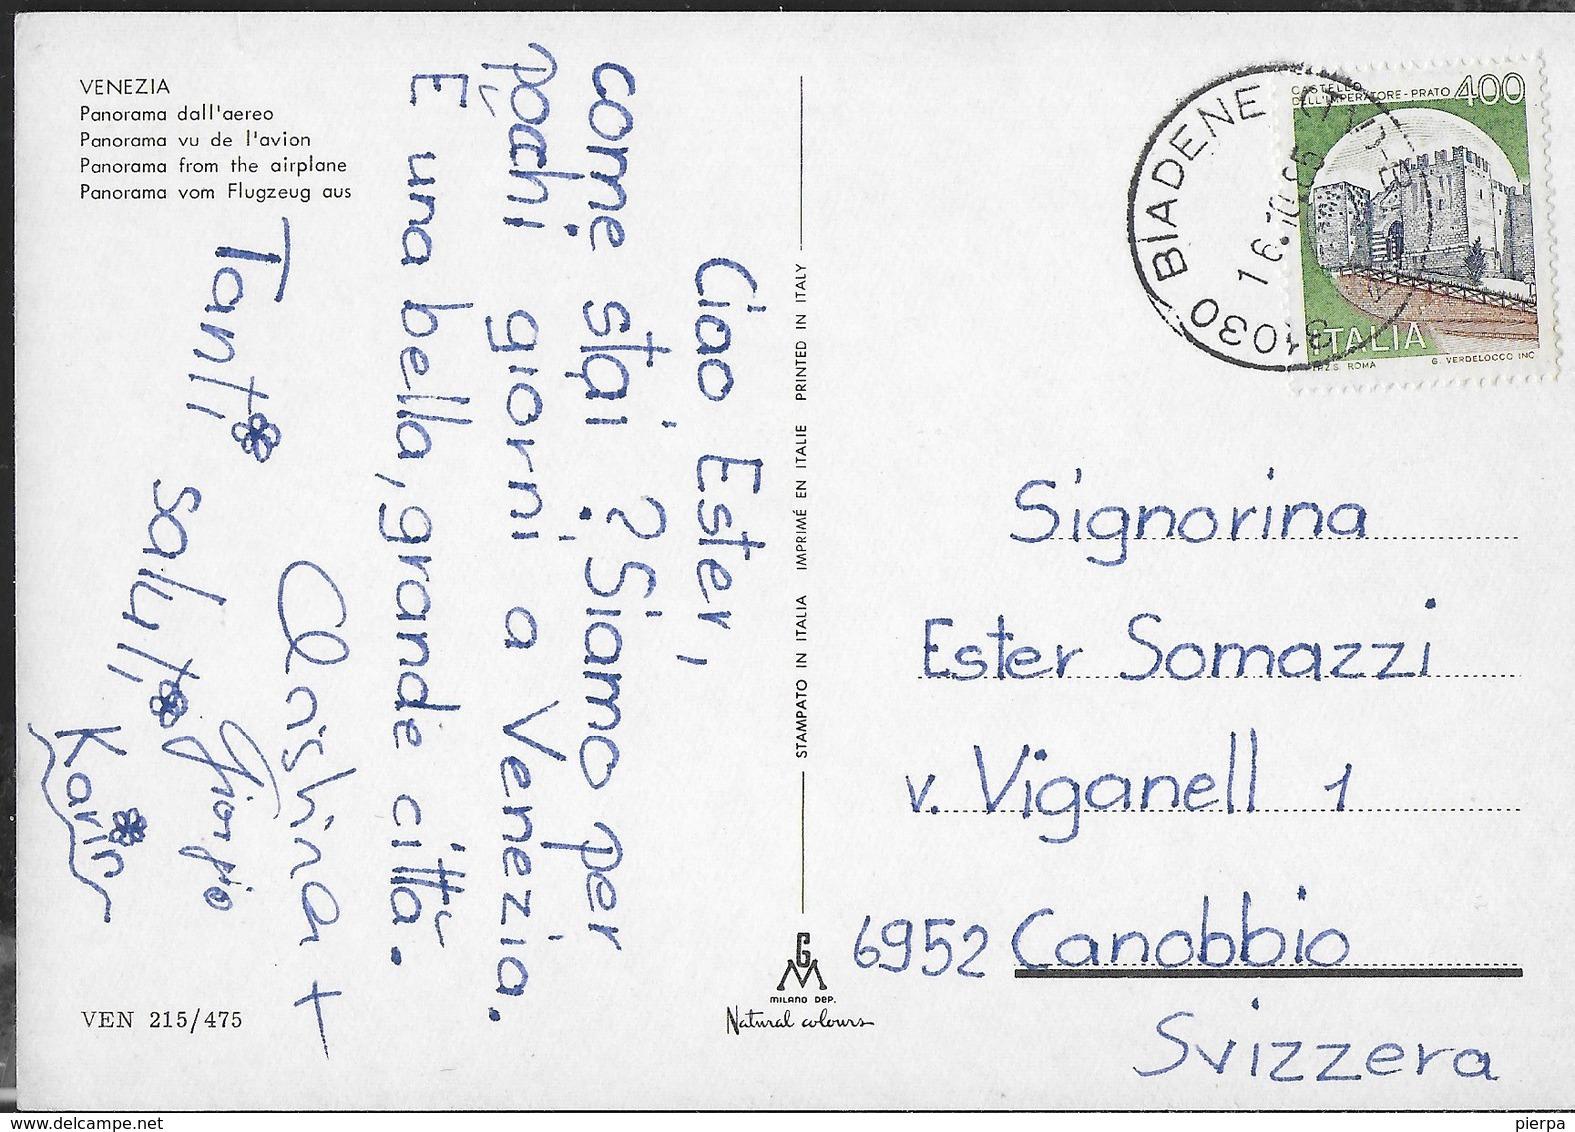 VENETO - VENEZIA - PANORAMA AEREO - VIAGGIATA DA BIADENE (TV) 1985 - Venezia